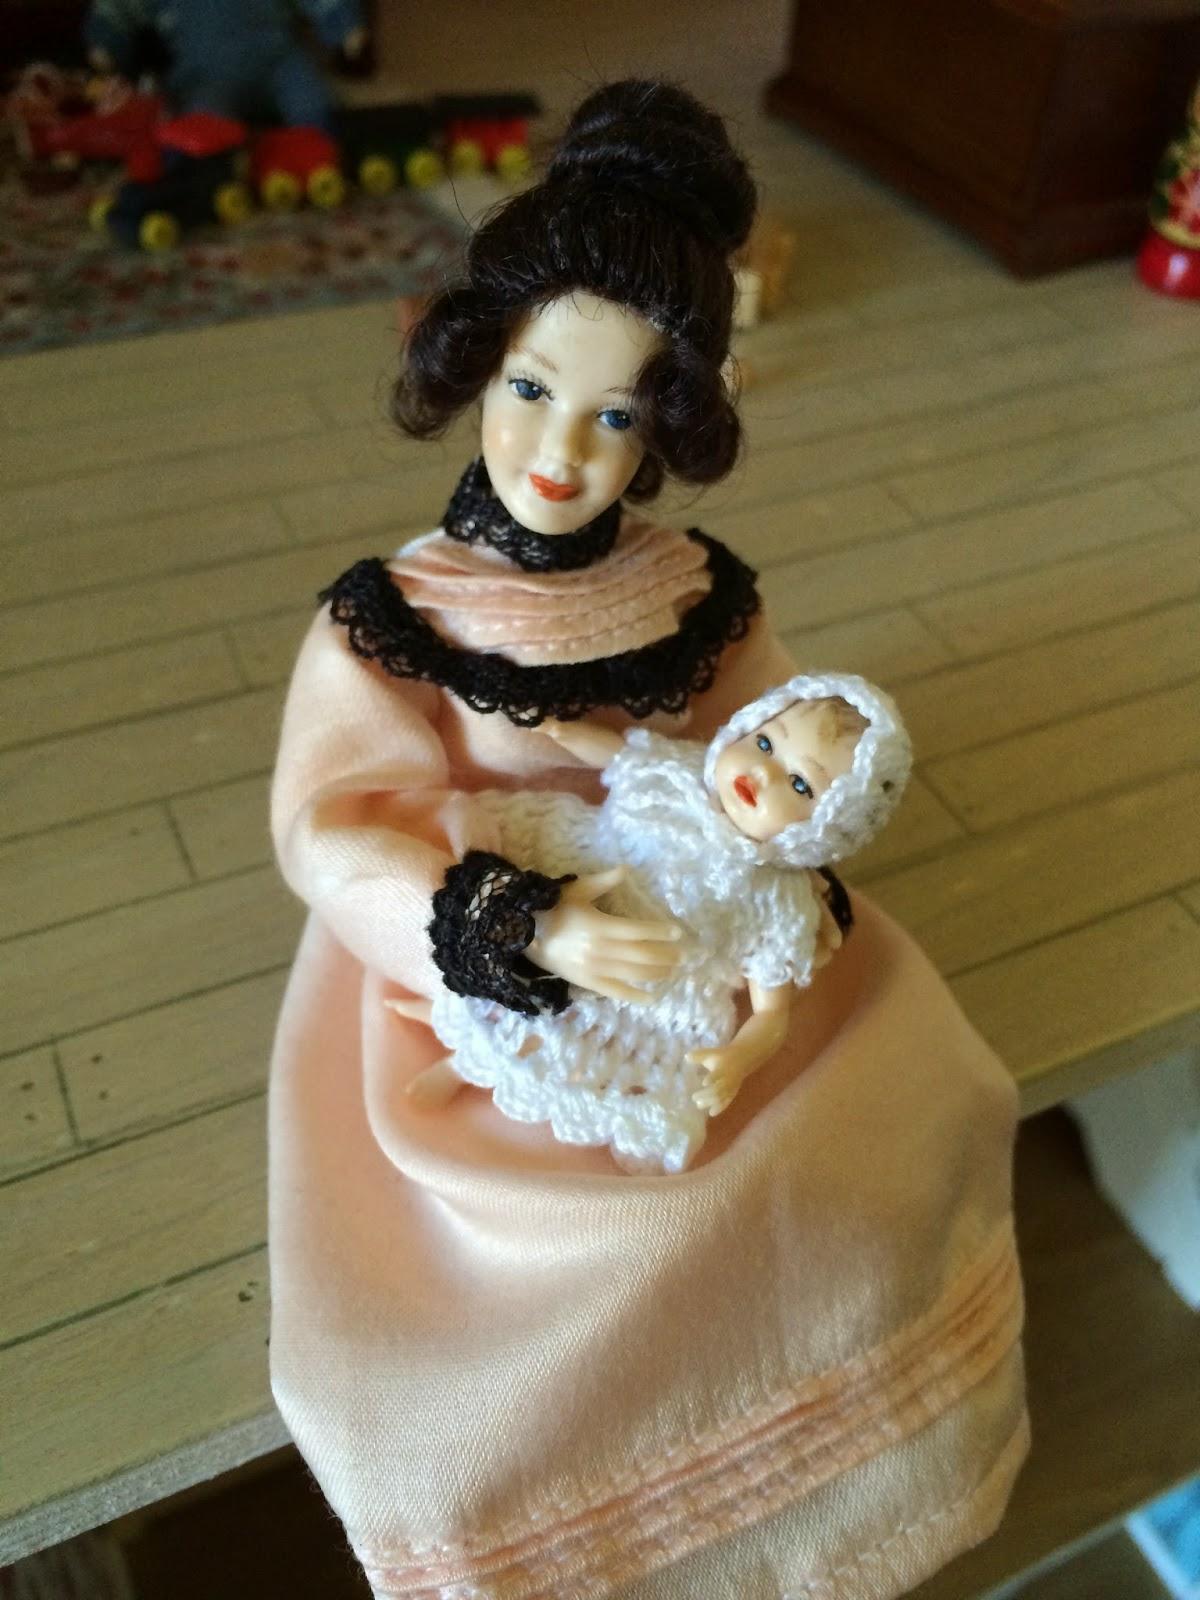 Handmade Long Gown and Bonnet for Heidi Ott Baby Doll Miniature